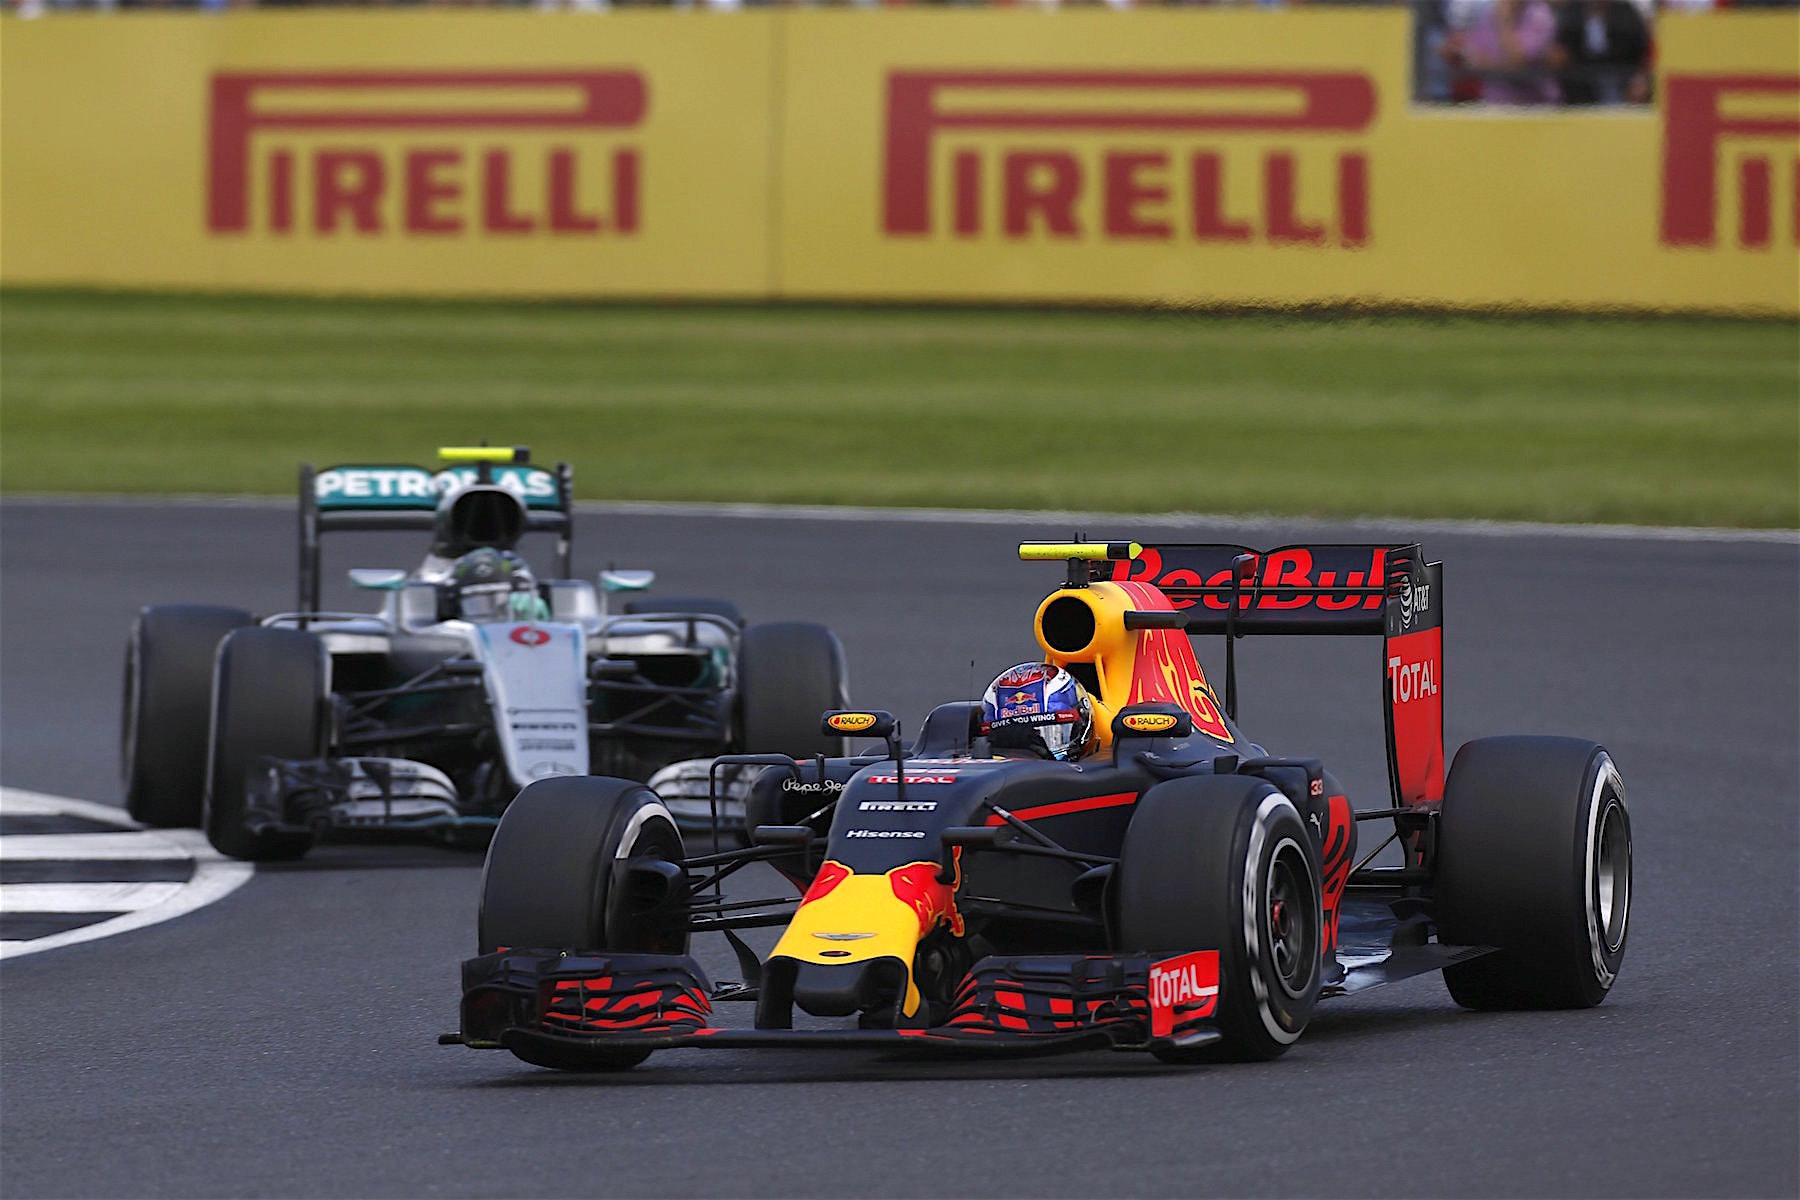 Salracing | Max Verstappen | Red Bull Racing